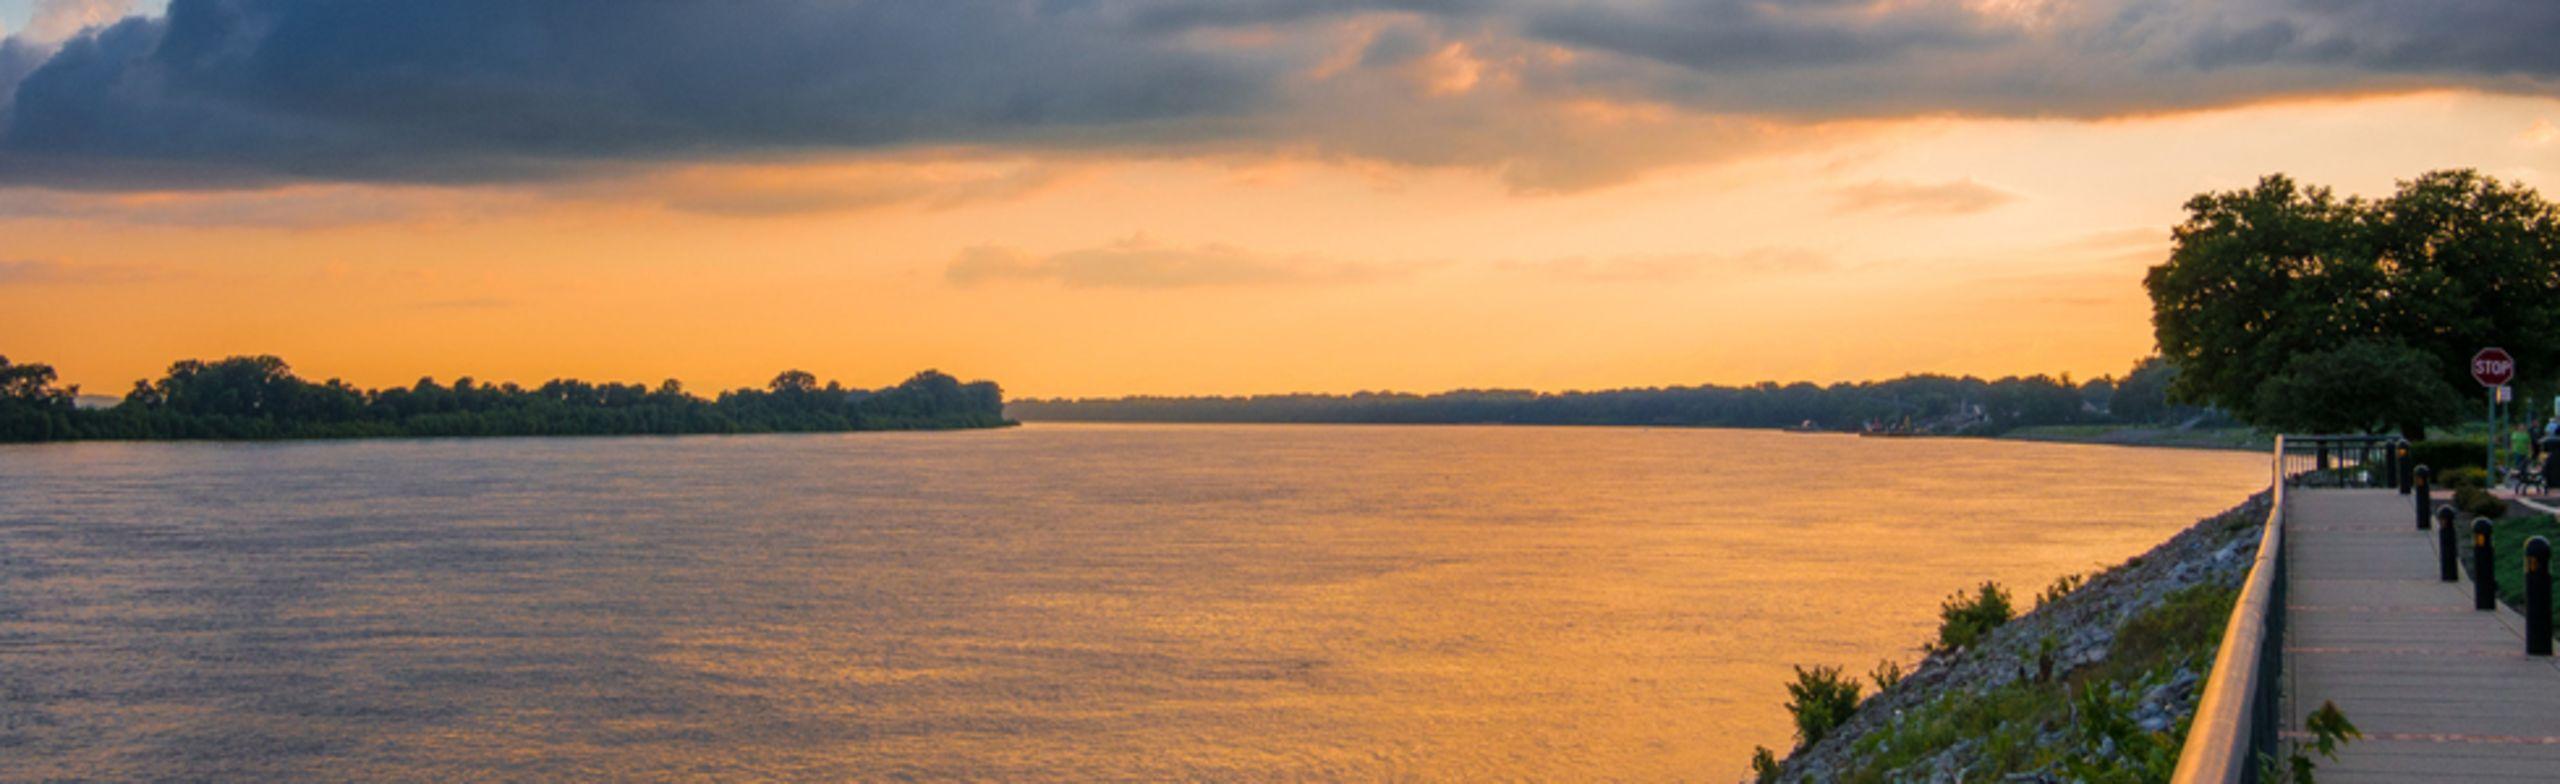 Newburgh Riverfront